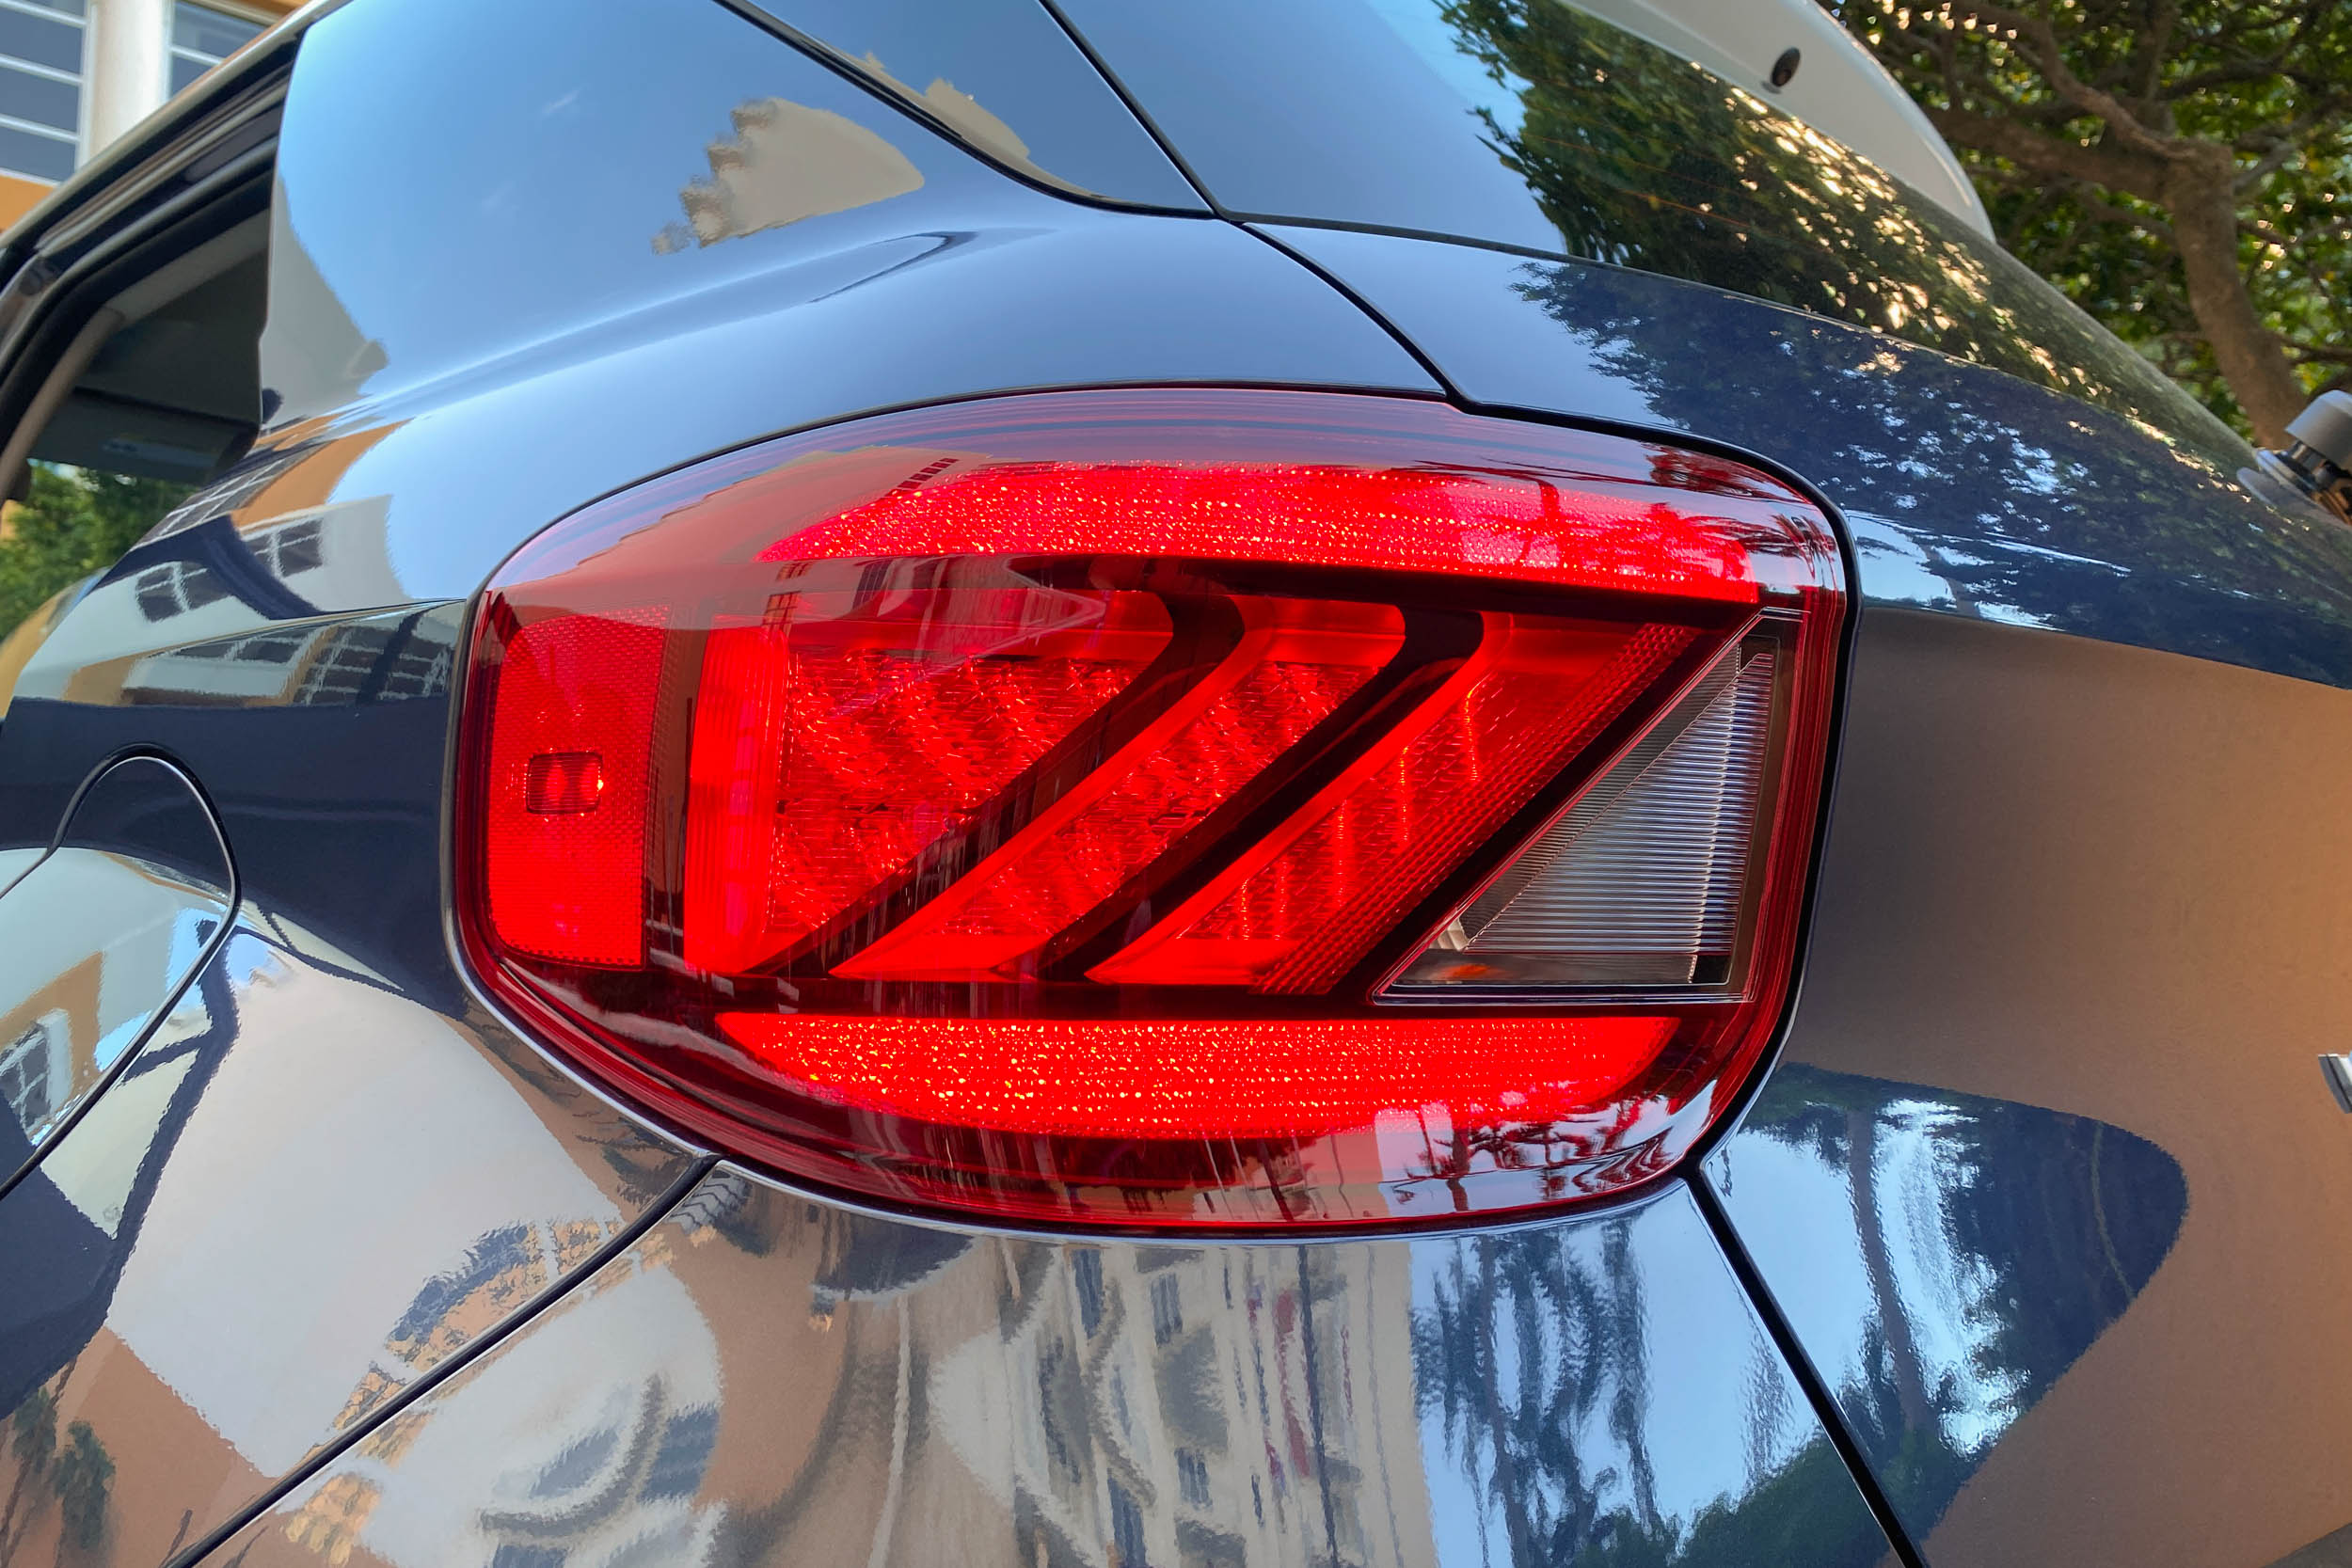 Rear Lighting Detail